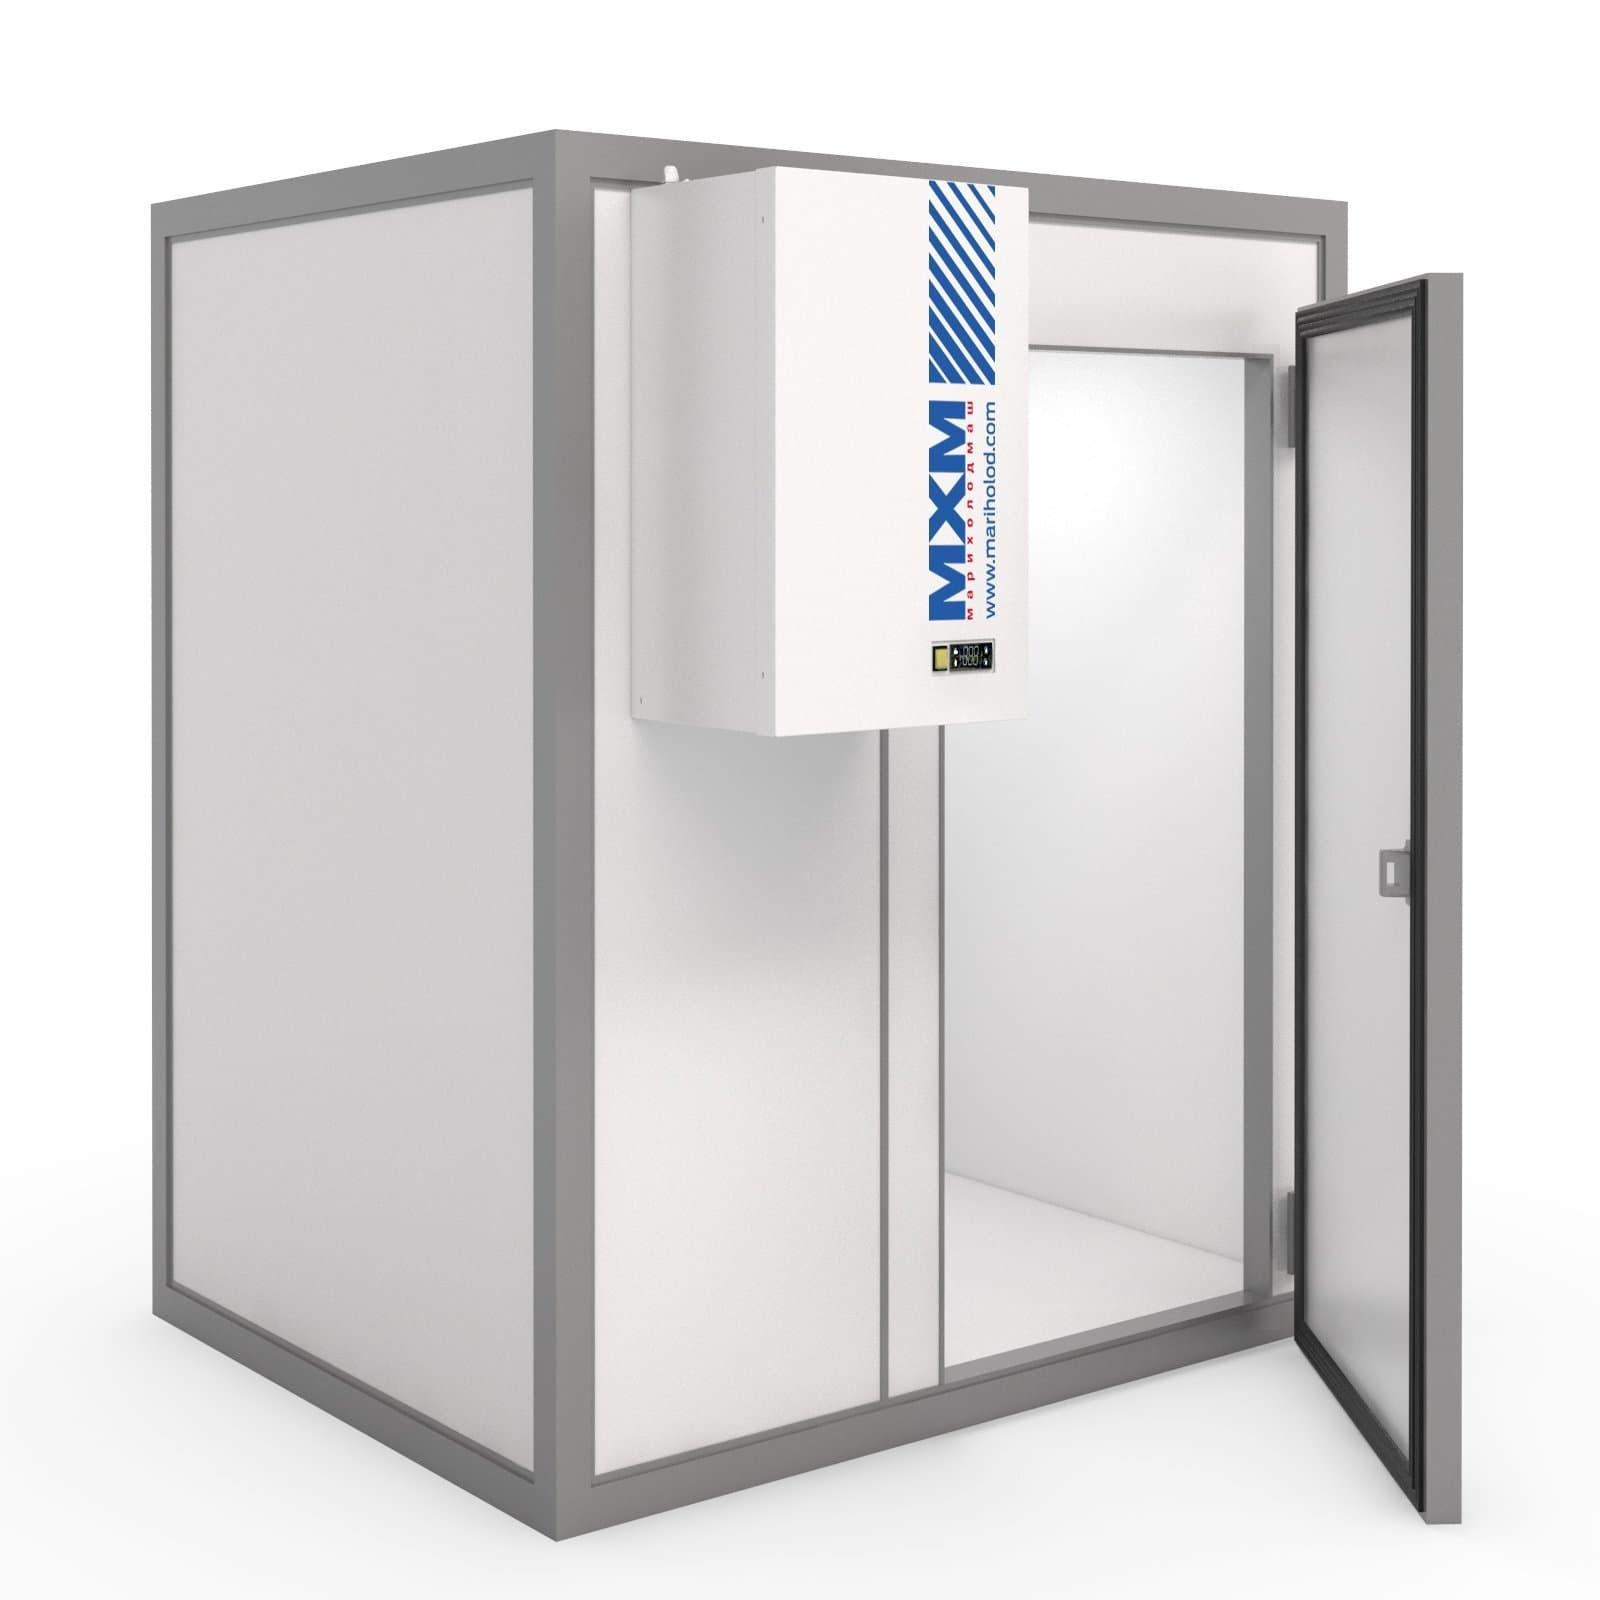 Камера холодильная МХМ КХН-11,98 1360×4060×2720